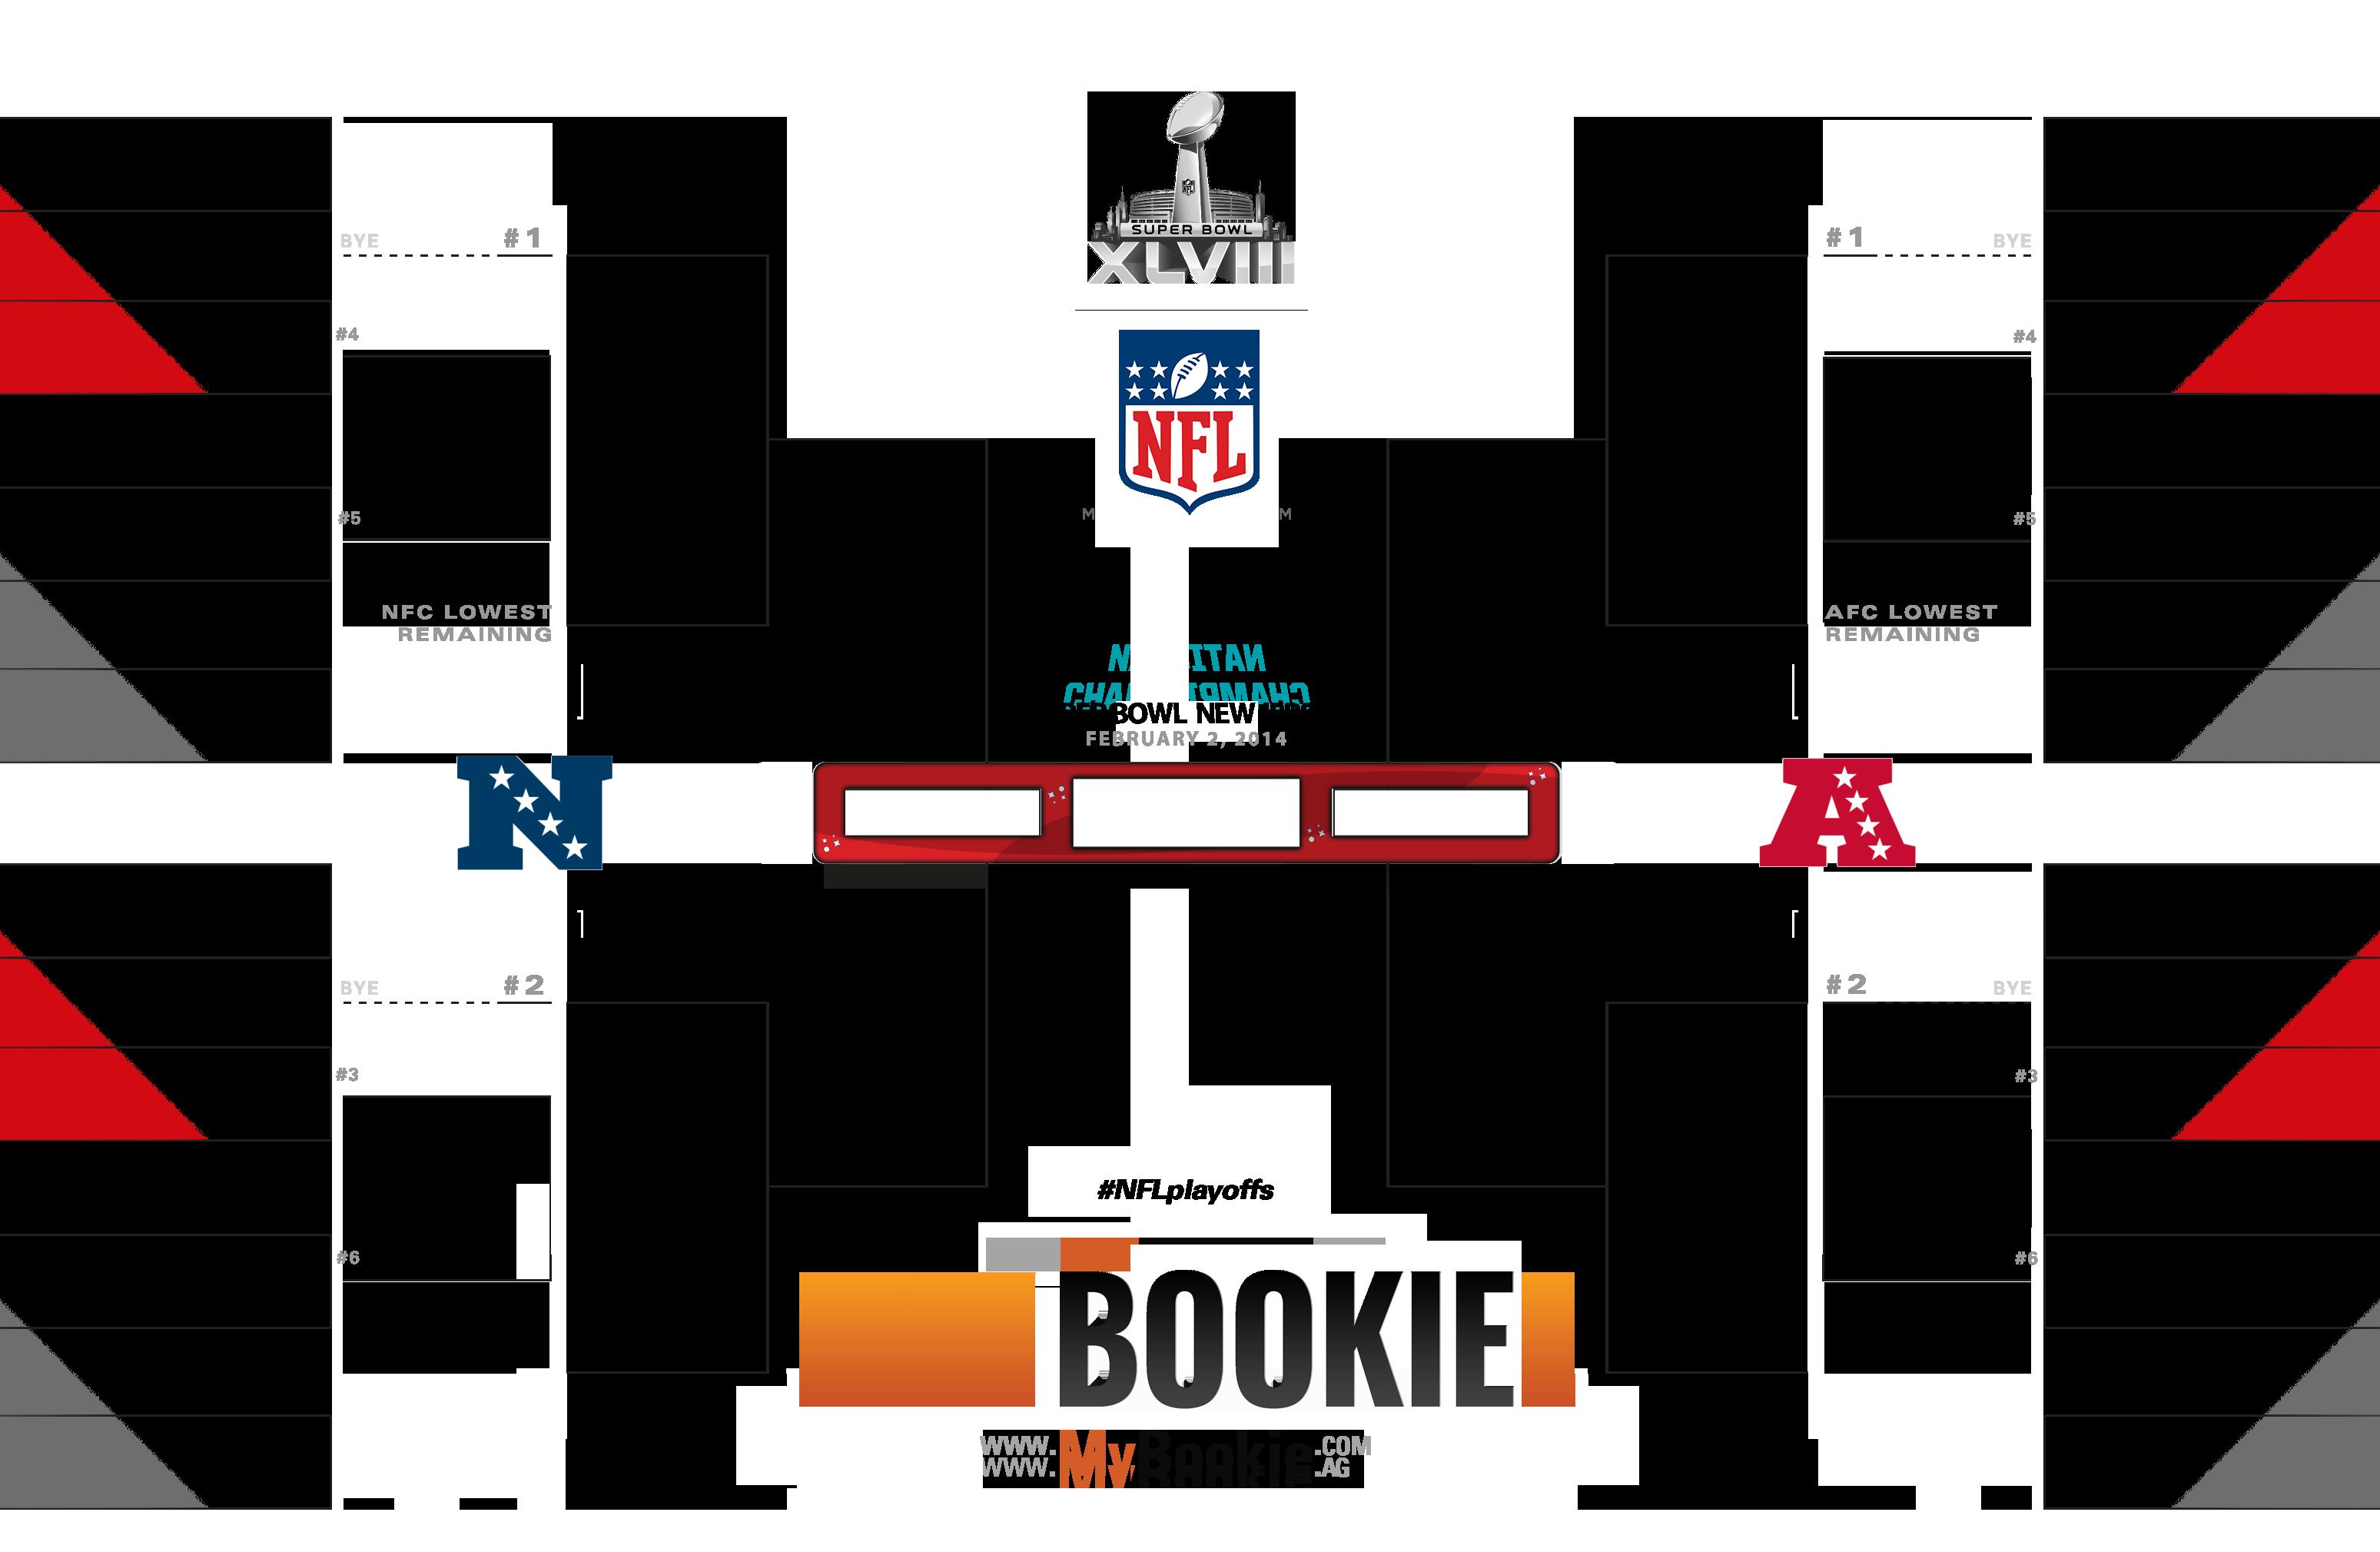 NFL Playoffs / Superbowl 2014 Printable Bracket